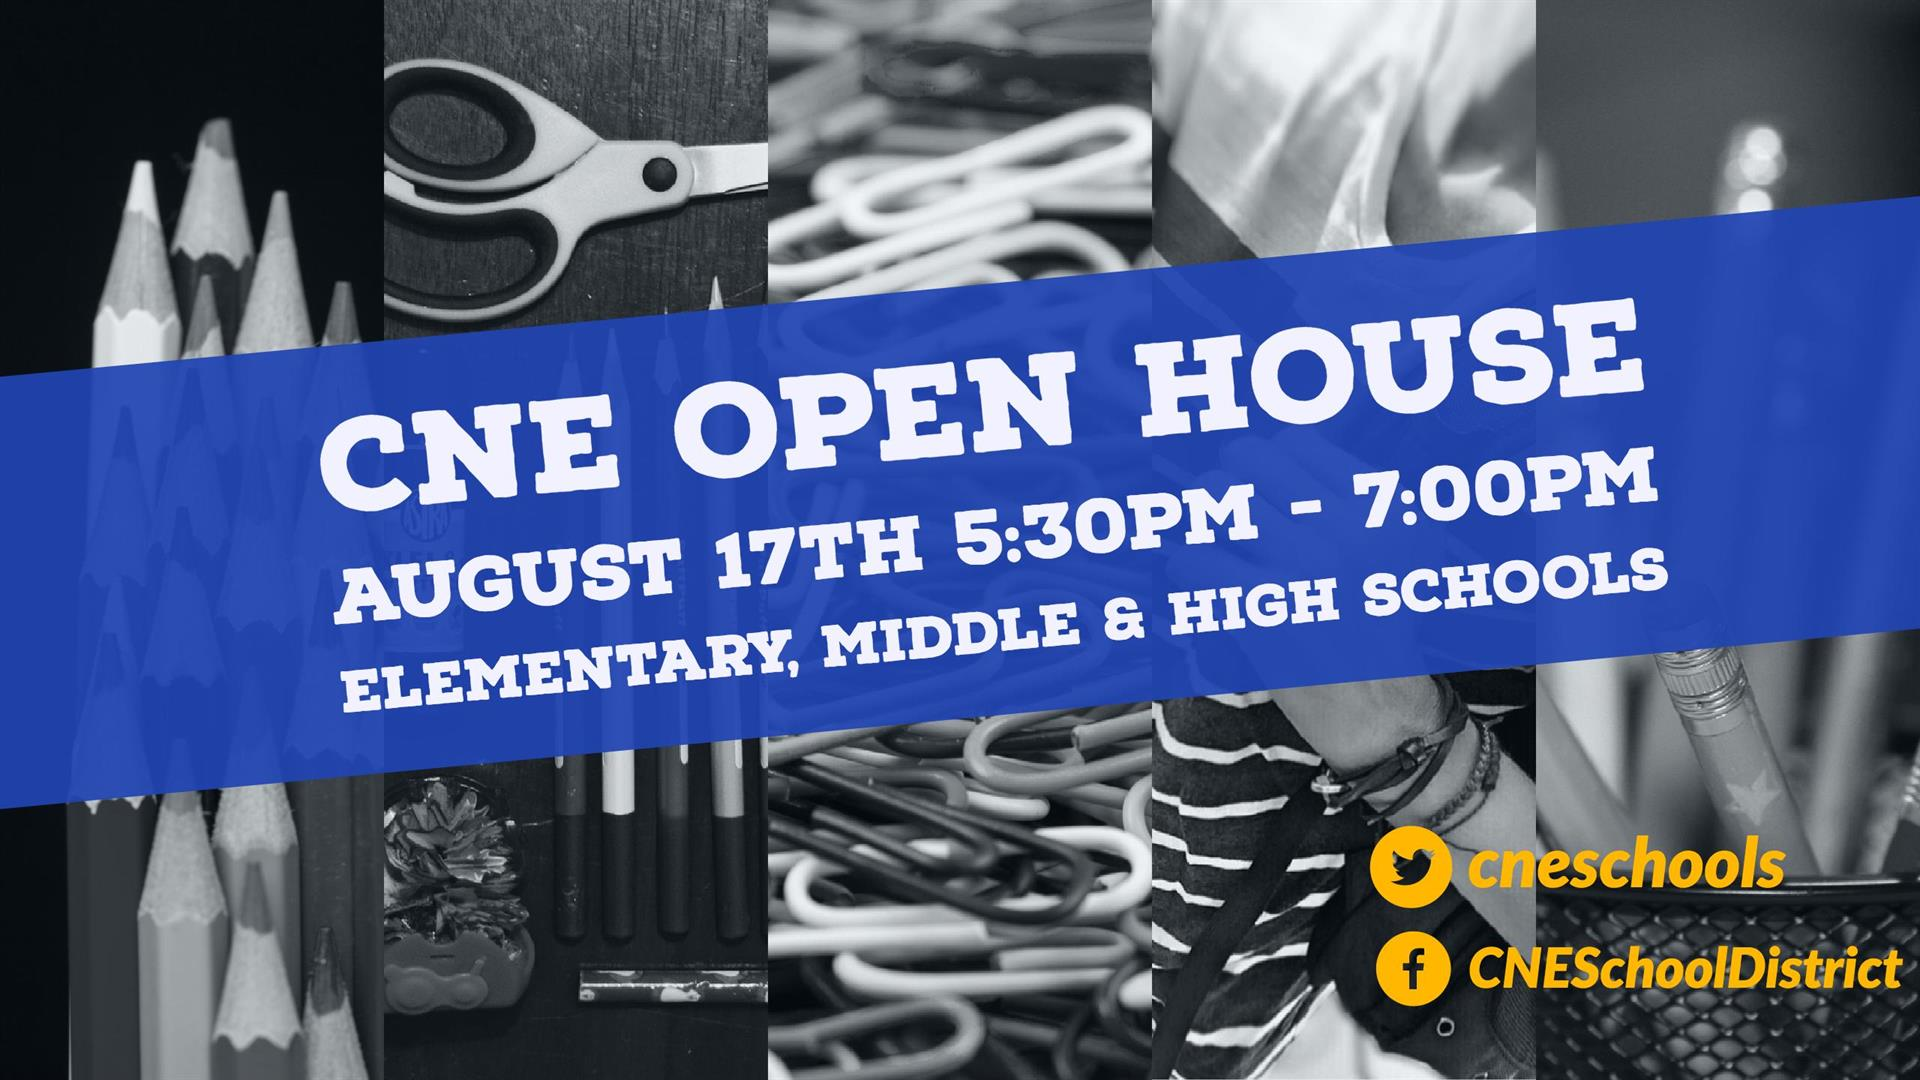 CNE Open House